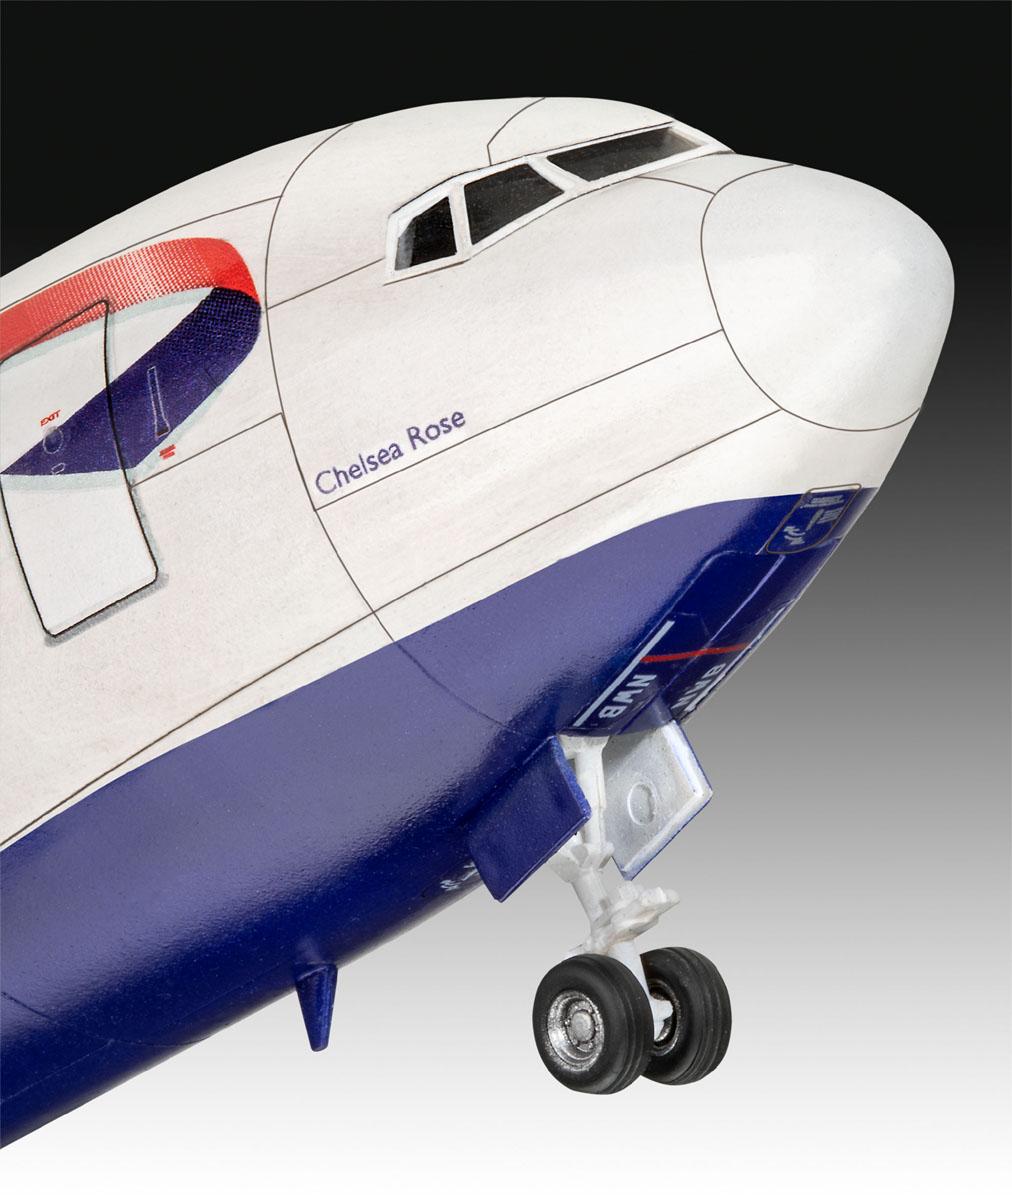 Boeing 767-300ER British Airways - 1/144 - Revell 03862  - BLIMPS COMÉRCIO ELETRÔNICO